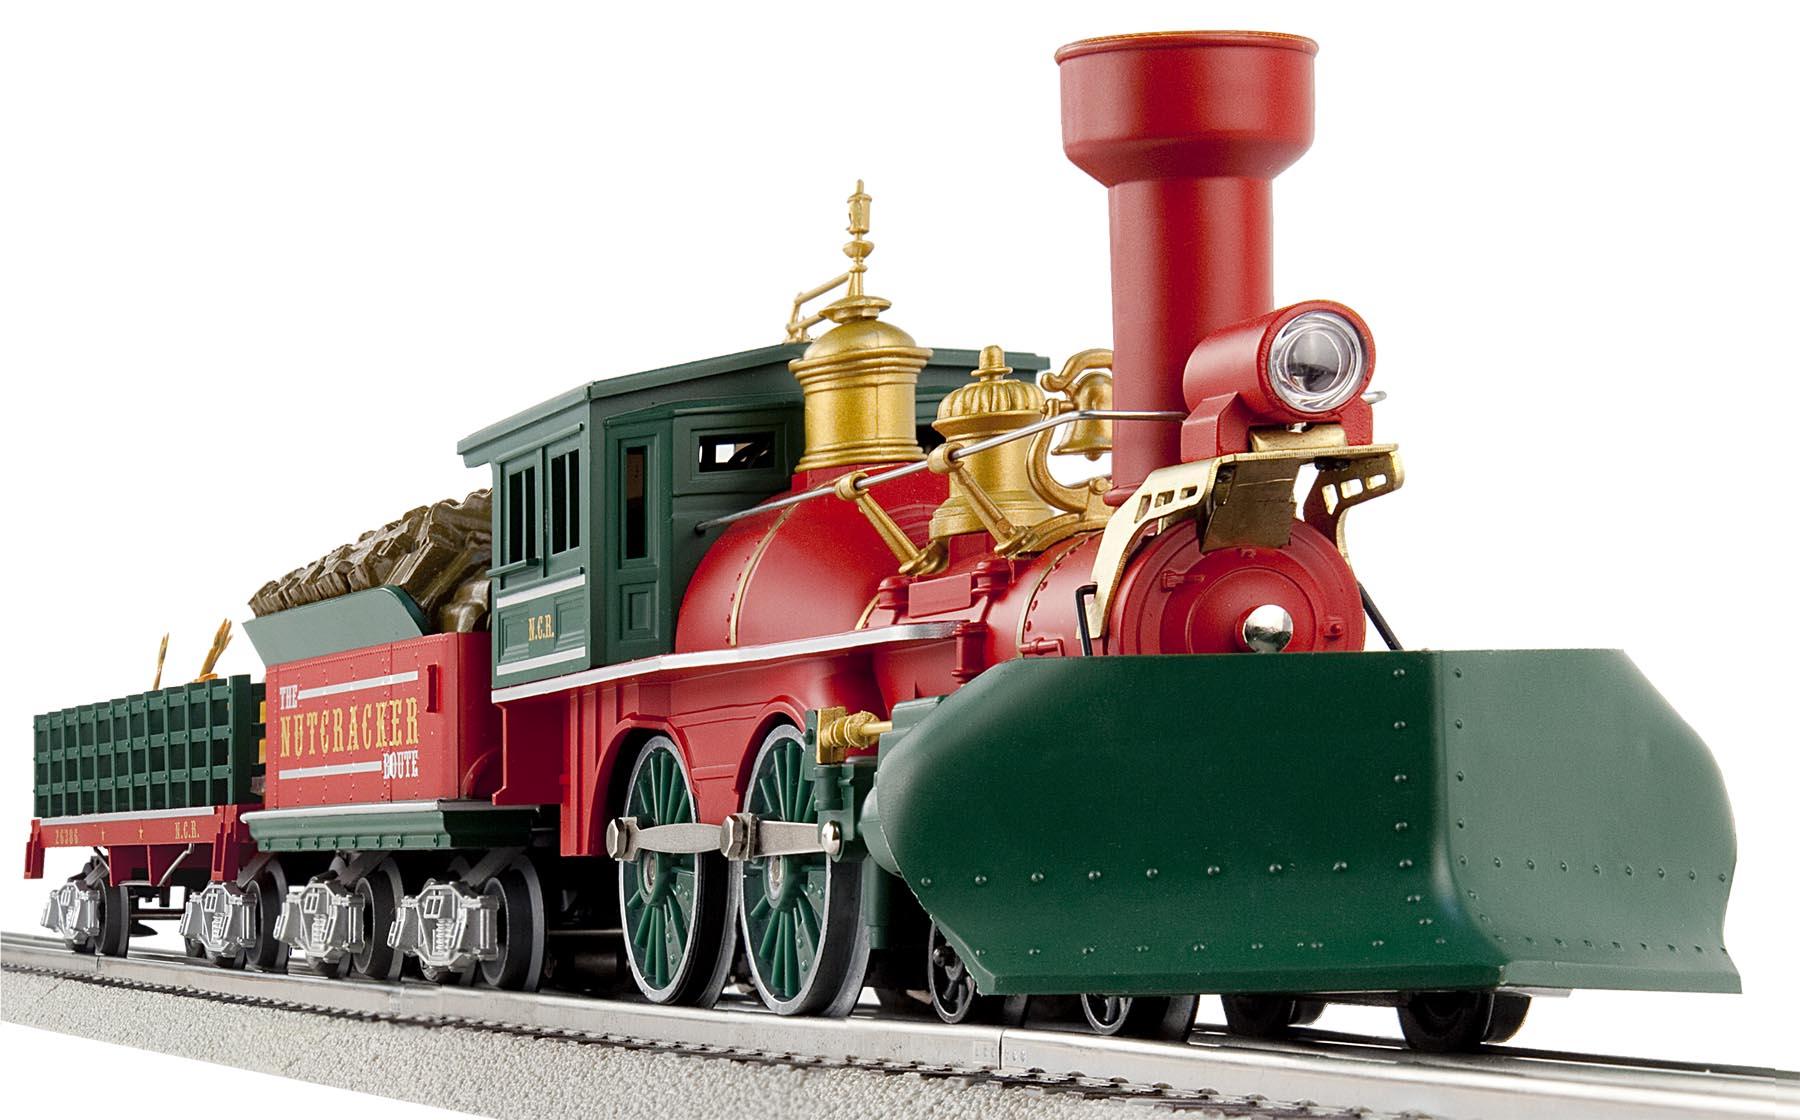 Nutcracker Route Christmas Train Set 440 General